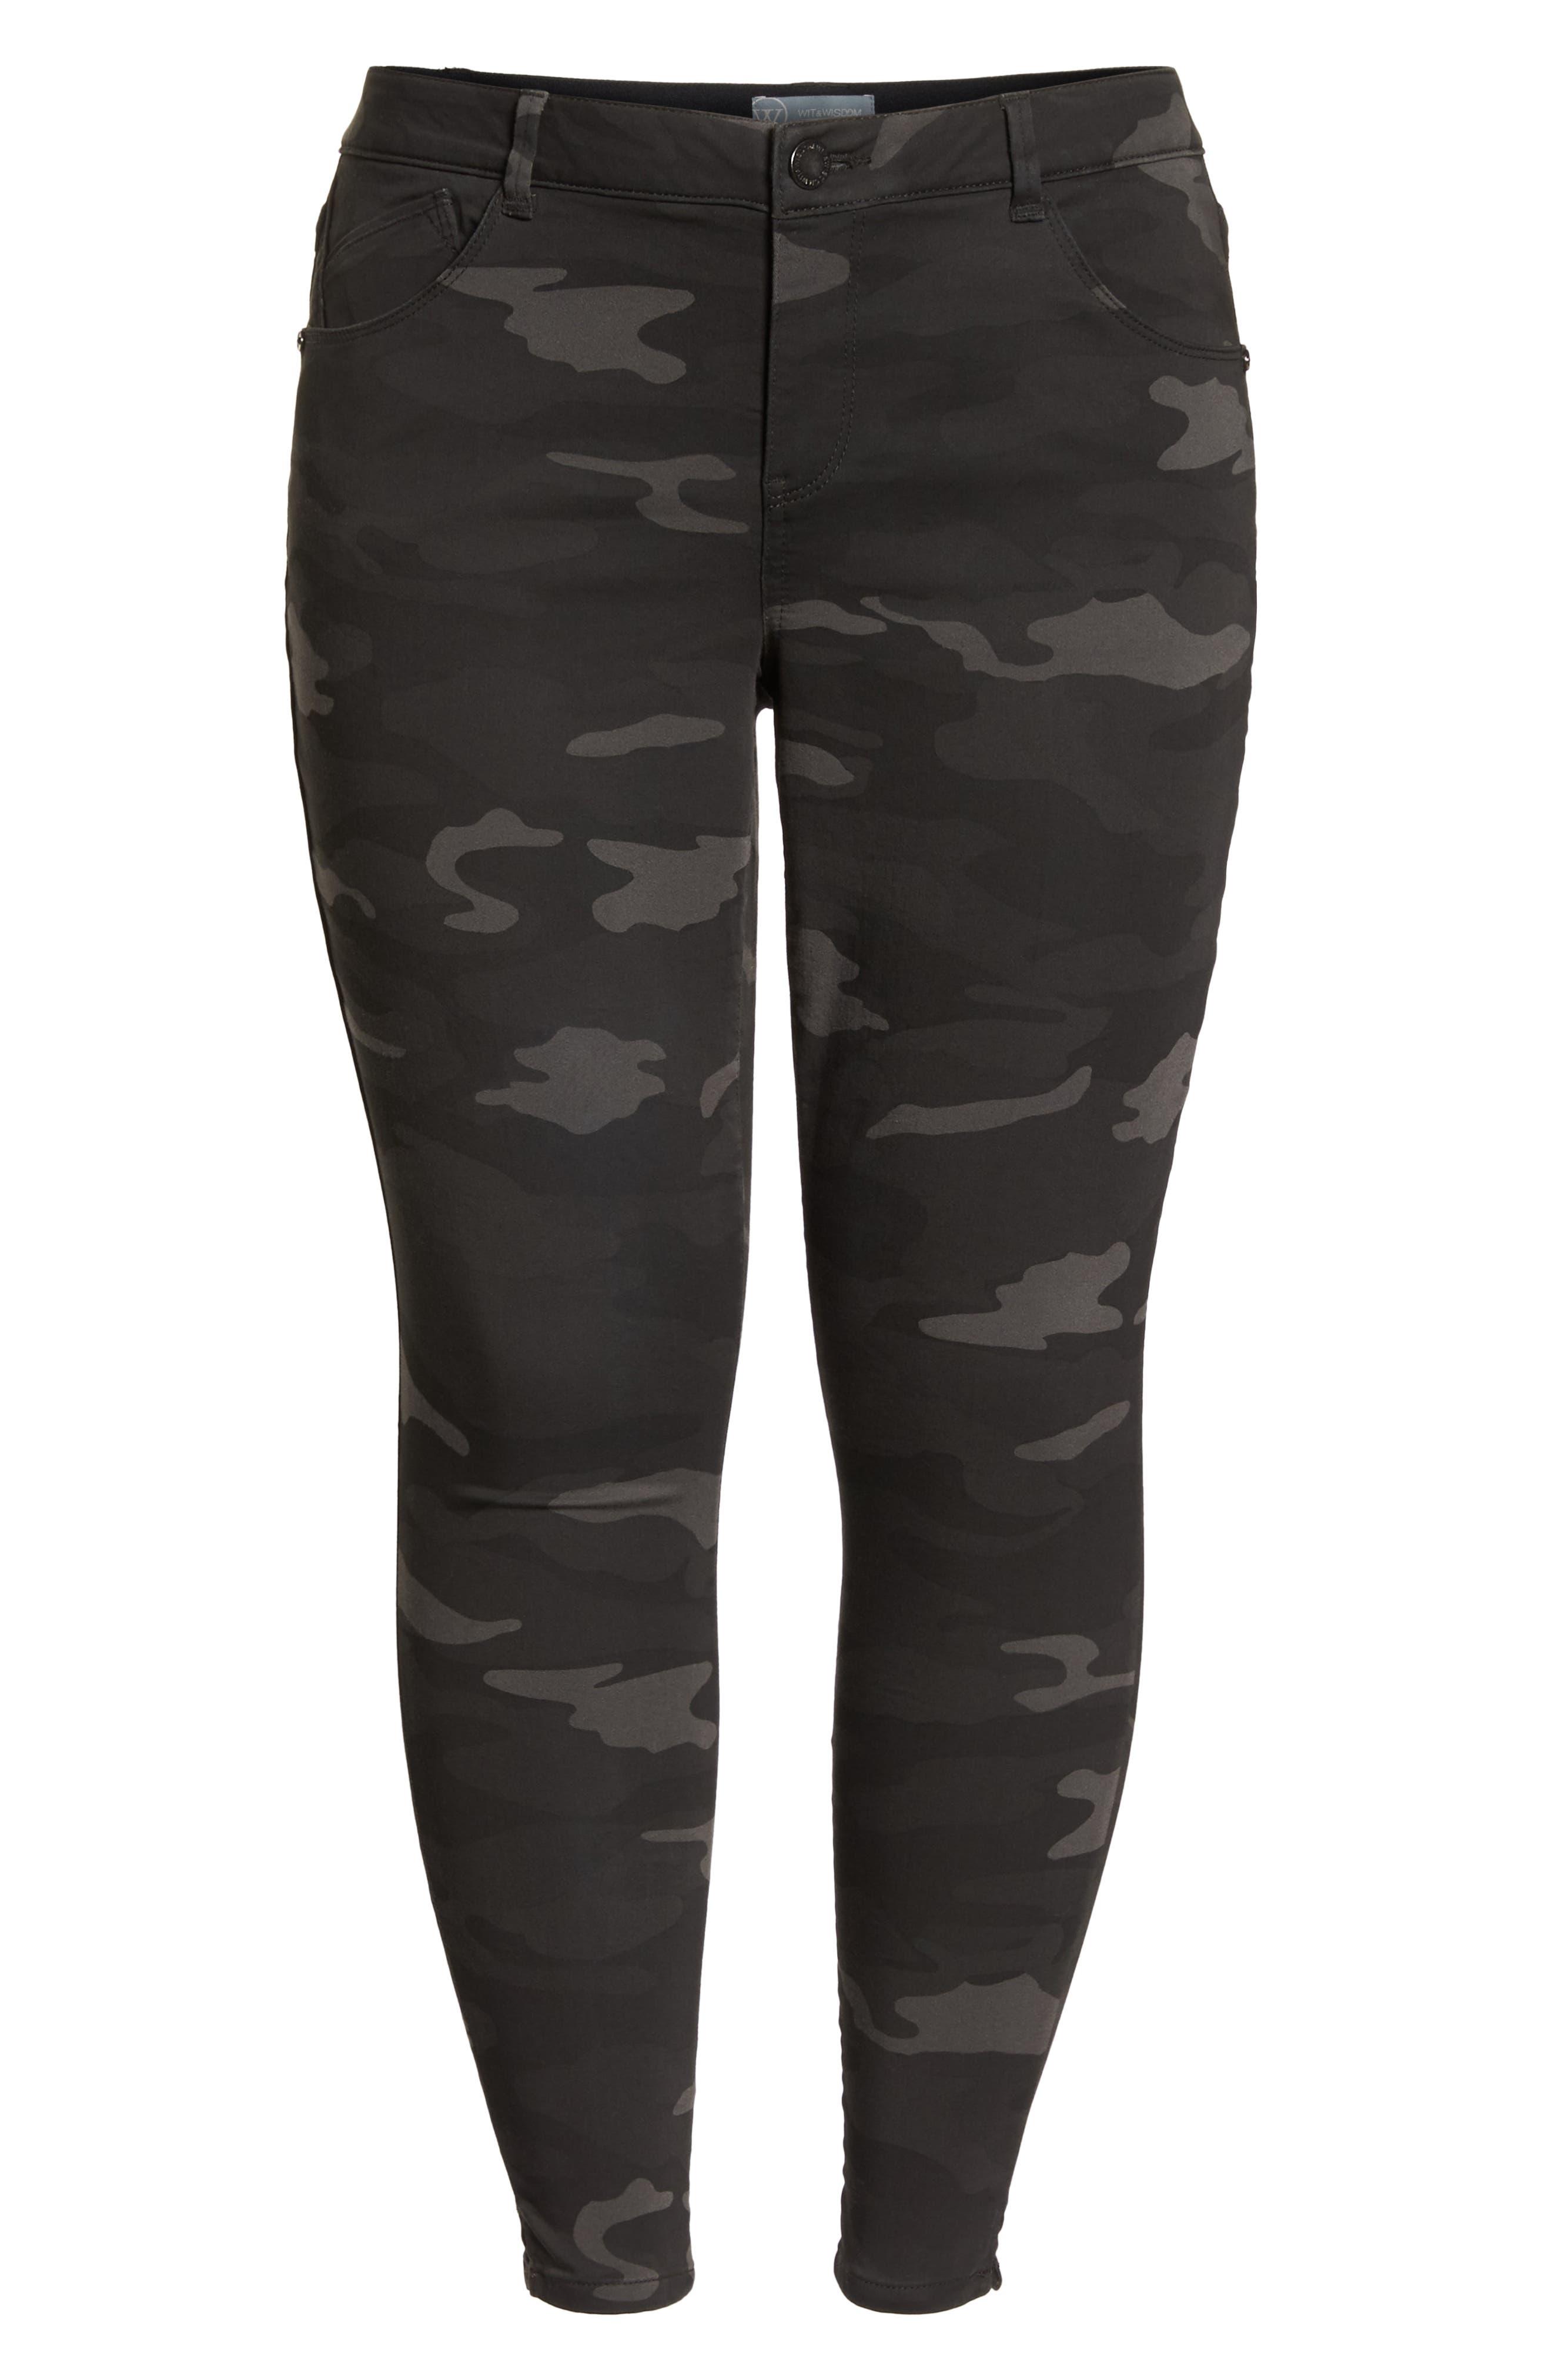 Ab-Solution Ankle Skimmer Jeans,                             Alternate thumbnail 7, color,                             BLACK/ CAMO